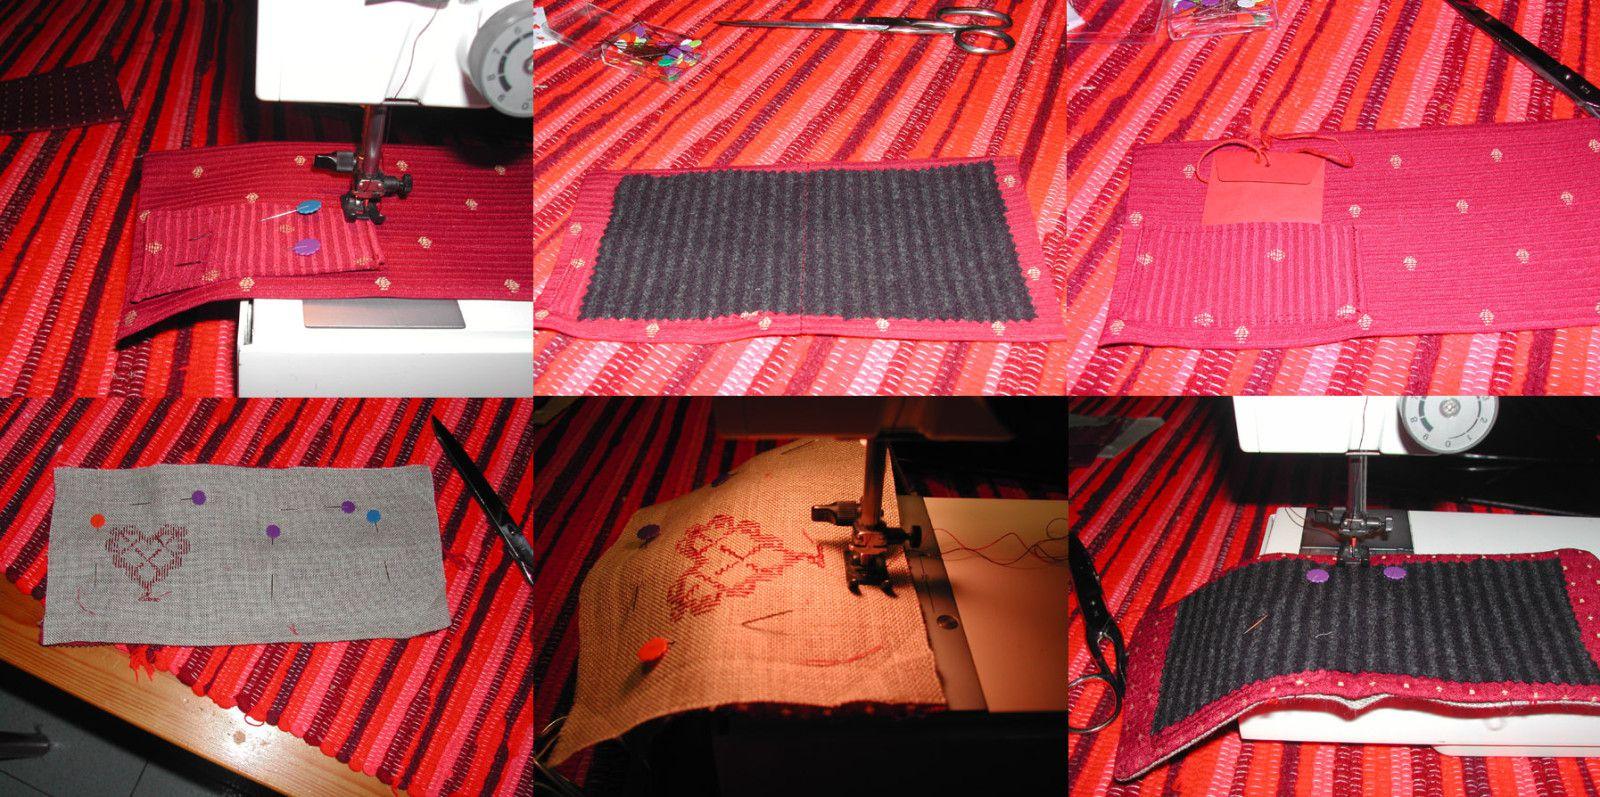 collage-portaaghi3-copie-1.jpg